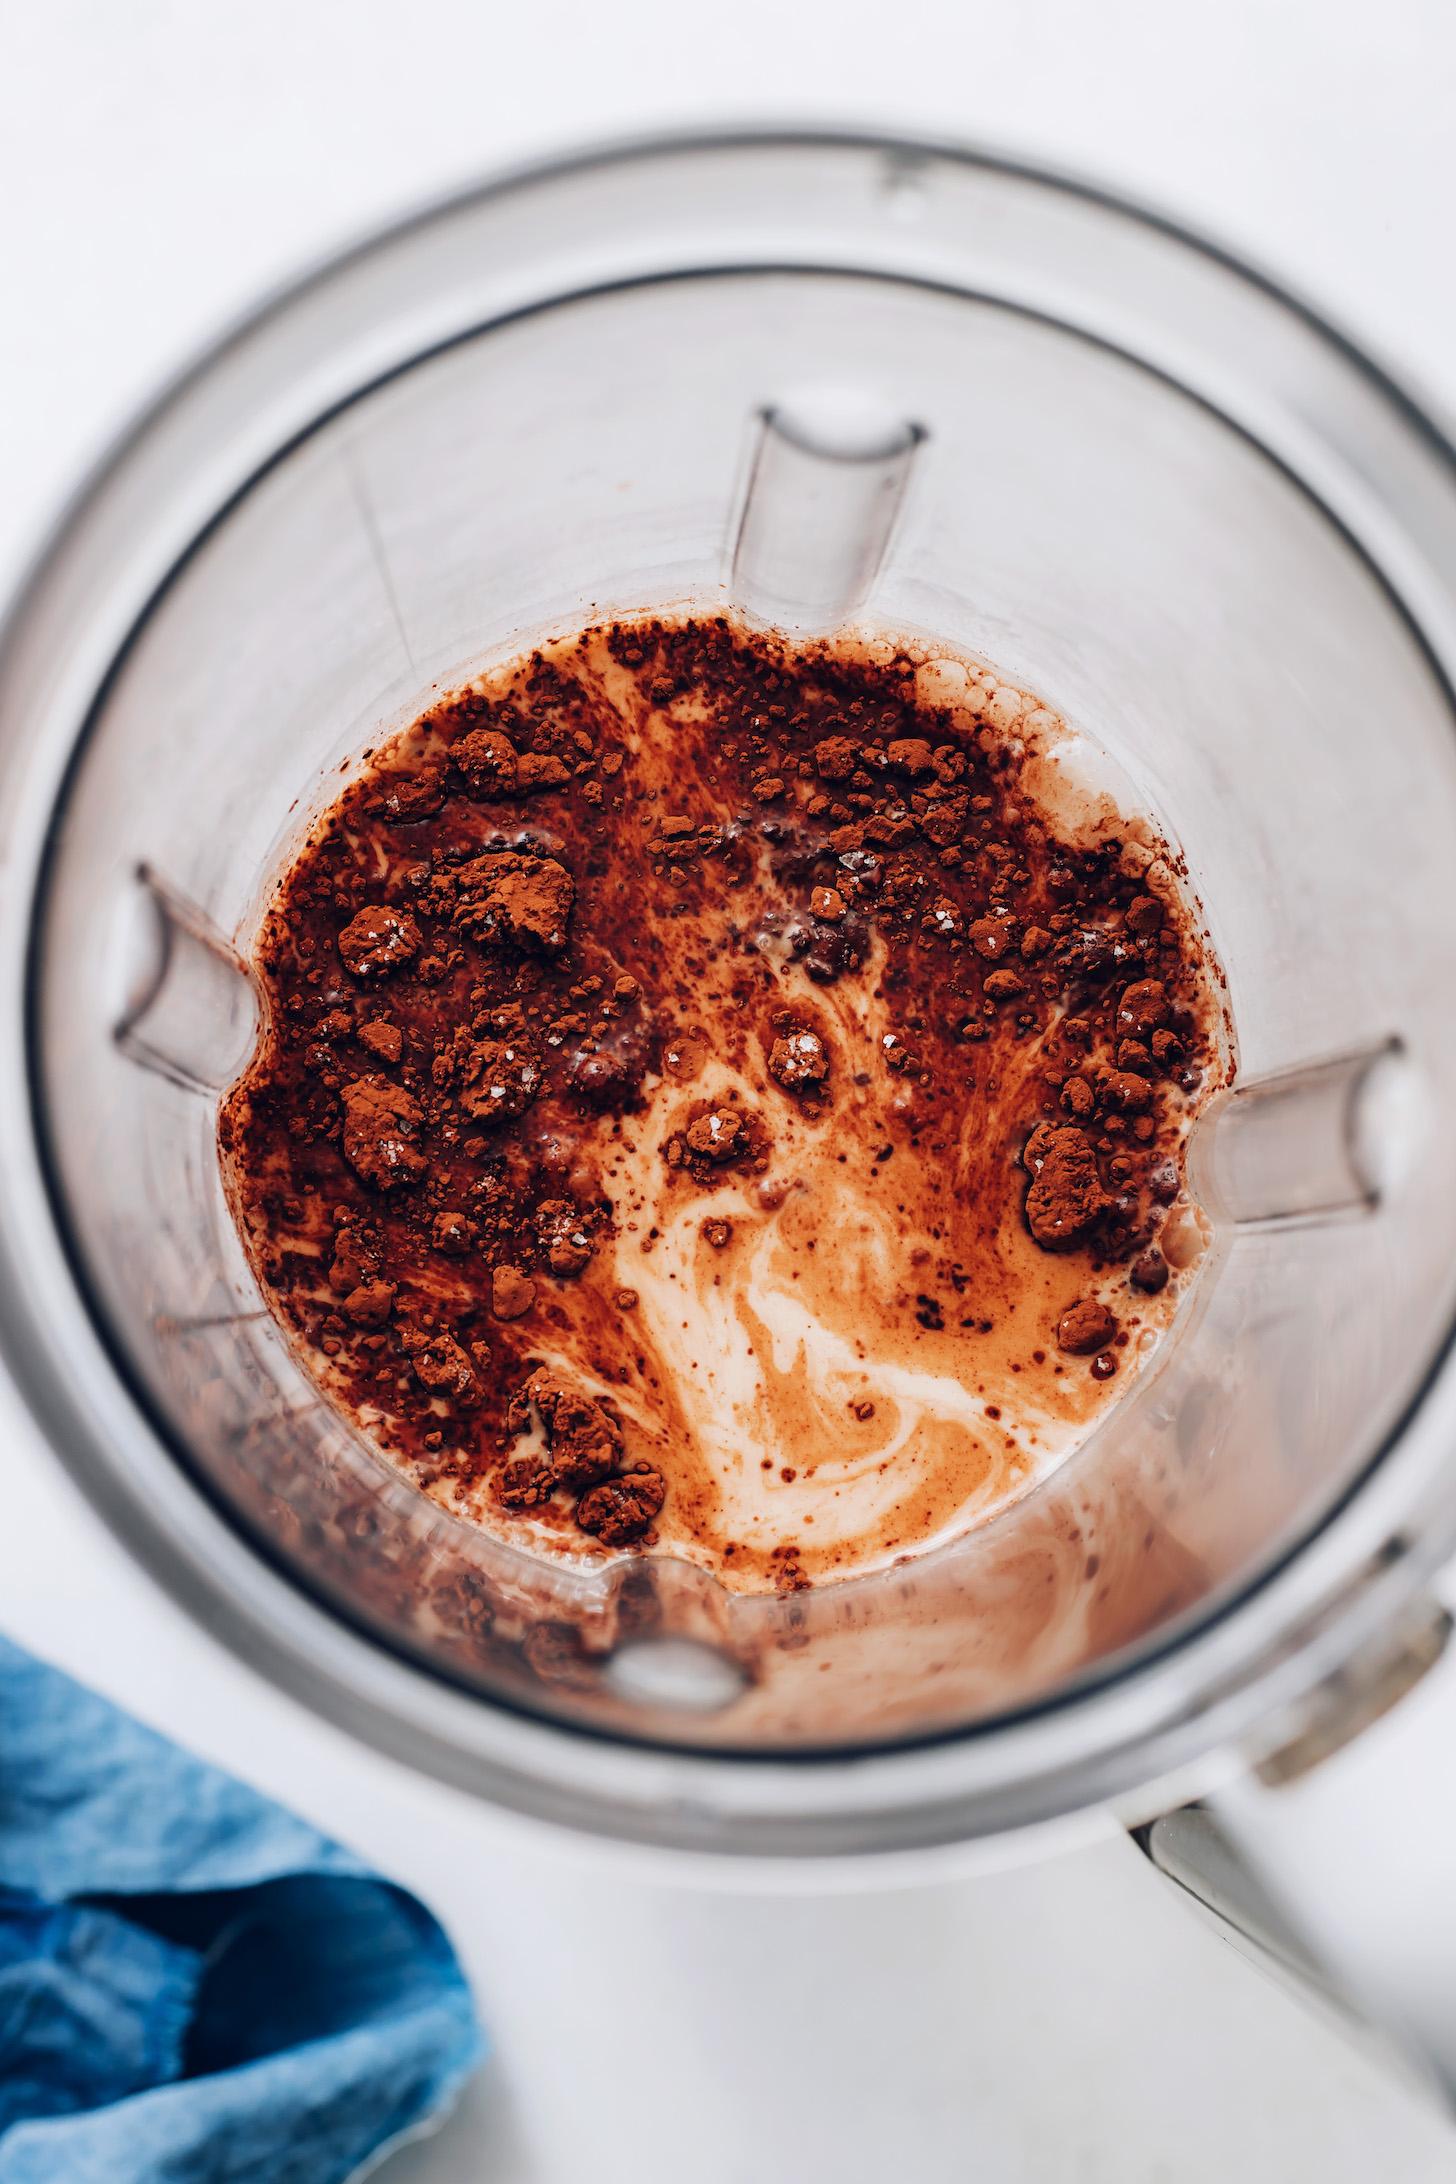 Blender with cocoa powder over creamy hazelnut milk